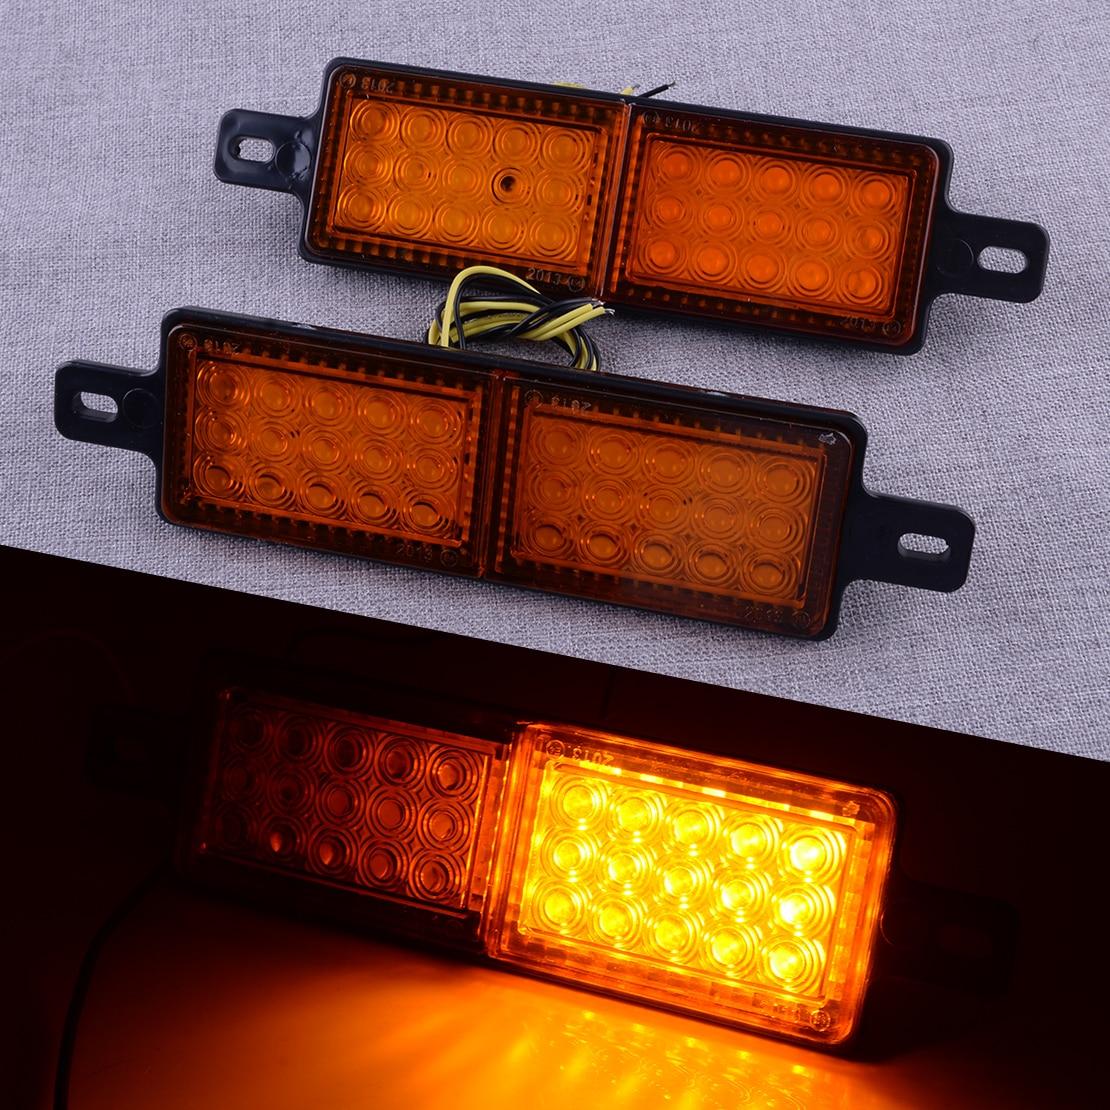 2Pcs Universal Amber 12V 30 LED Front Indicator Park Light Bull Bar Marker Lamp for Caravan Pickup Truck Trailer Boat Lorry Van